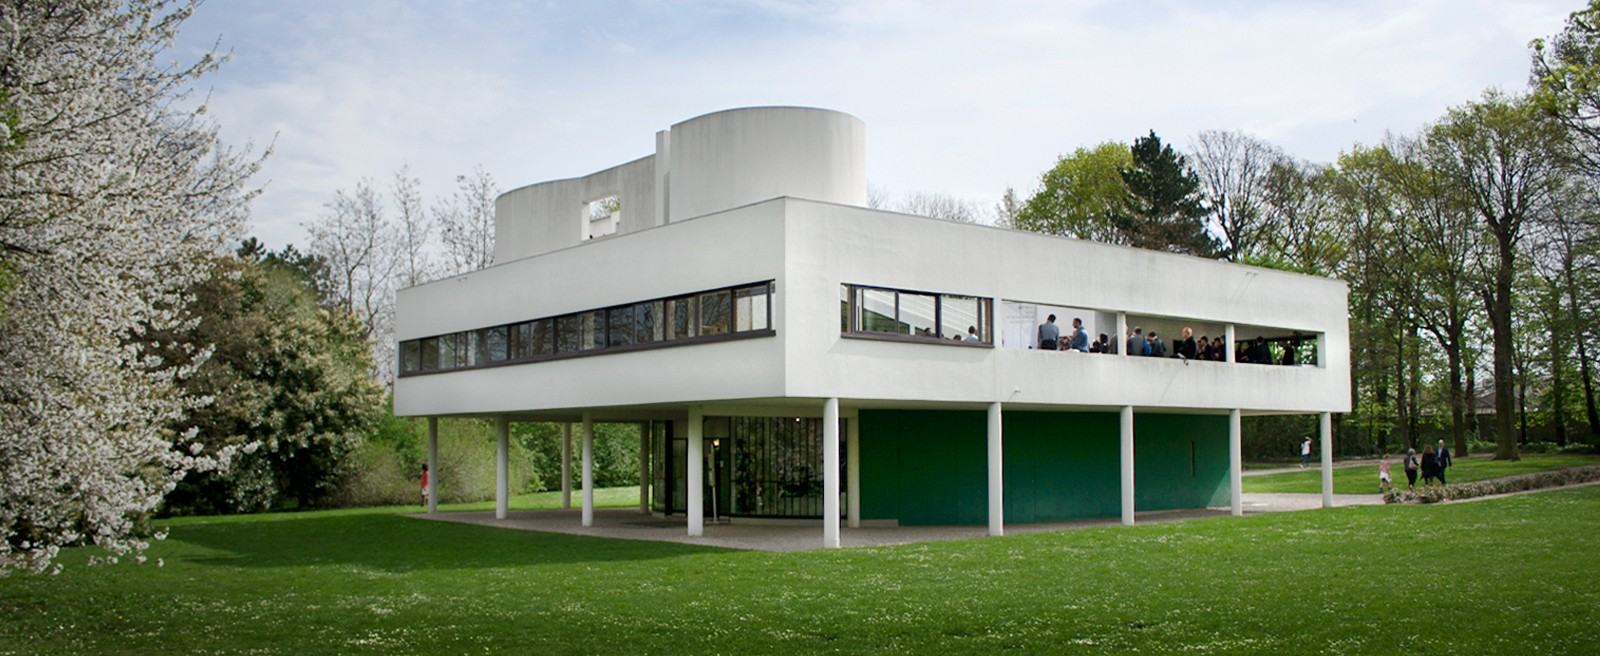 Sonda in Le Corbusier's Villa Savoye